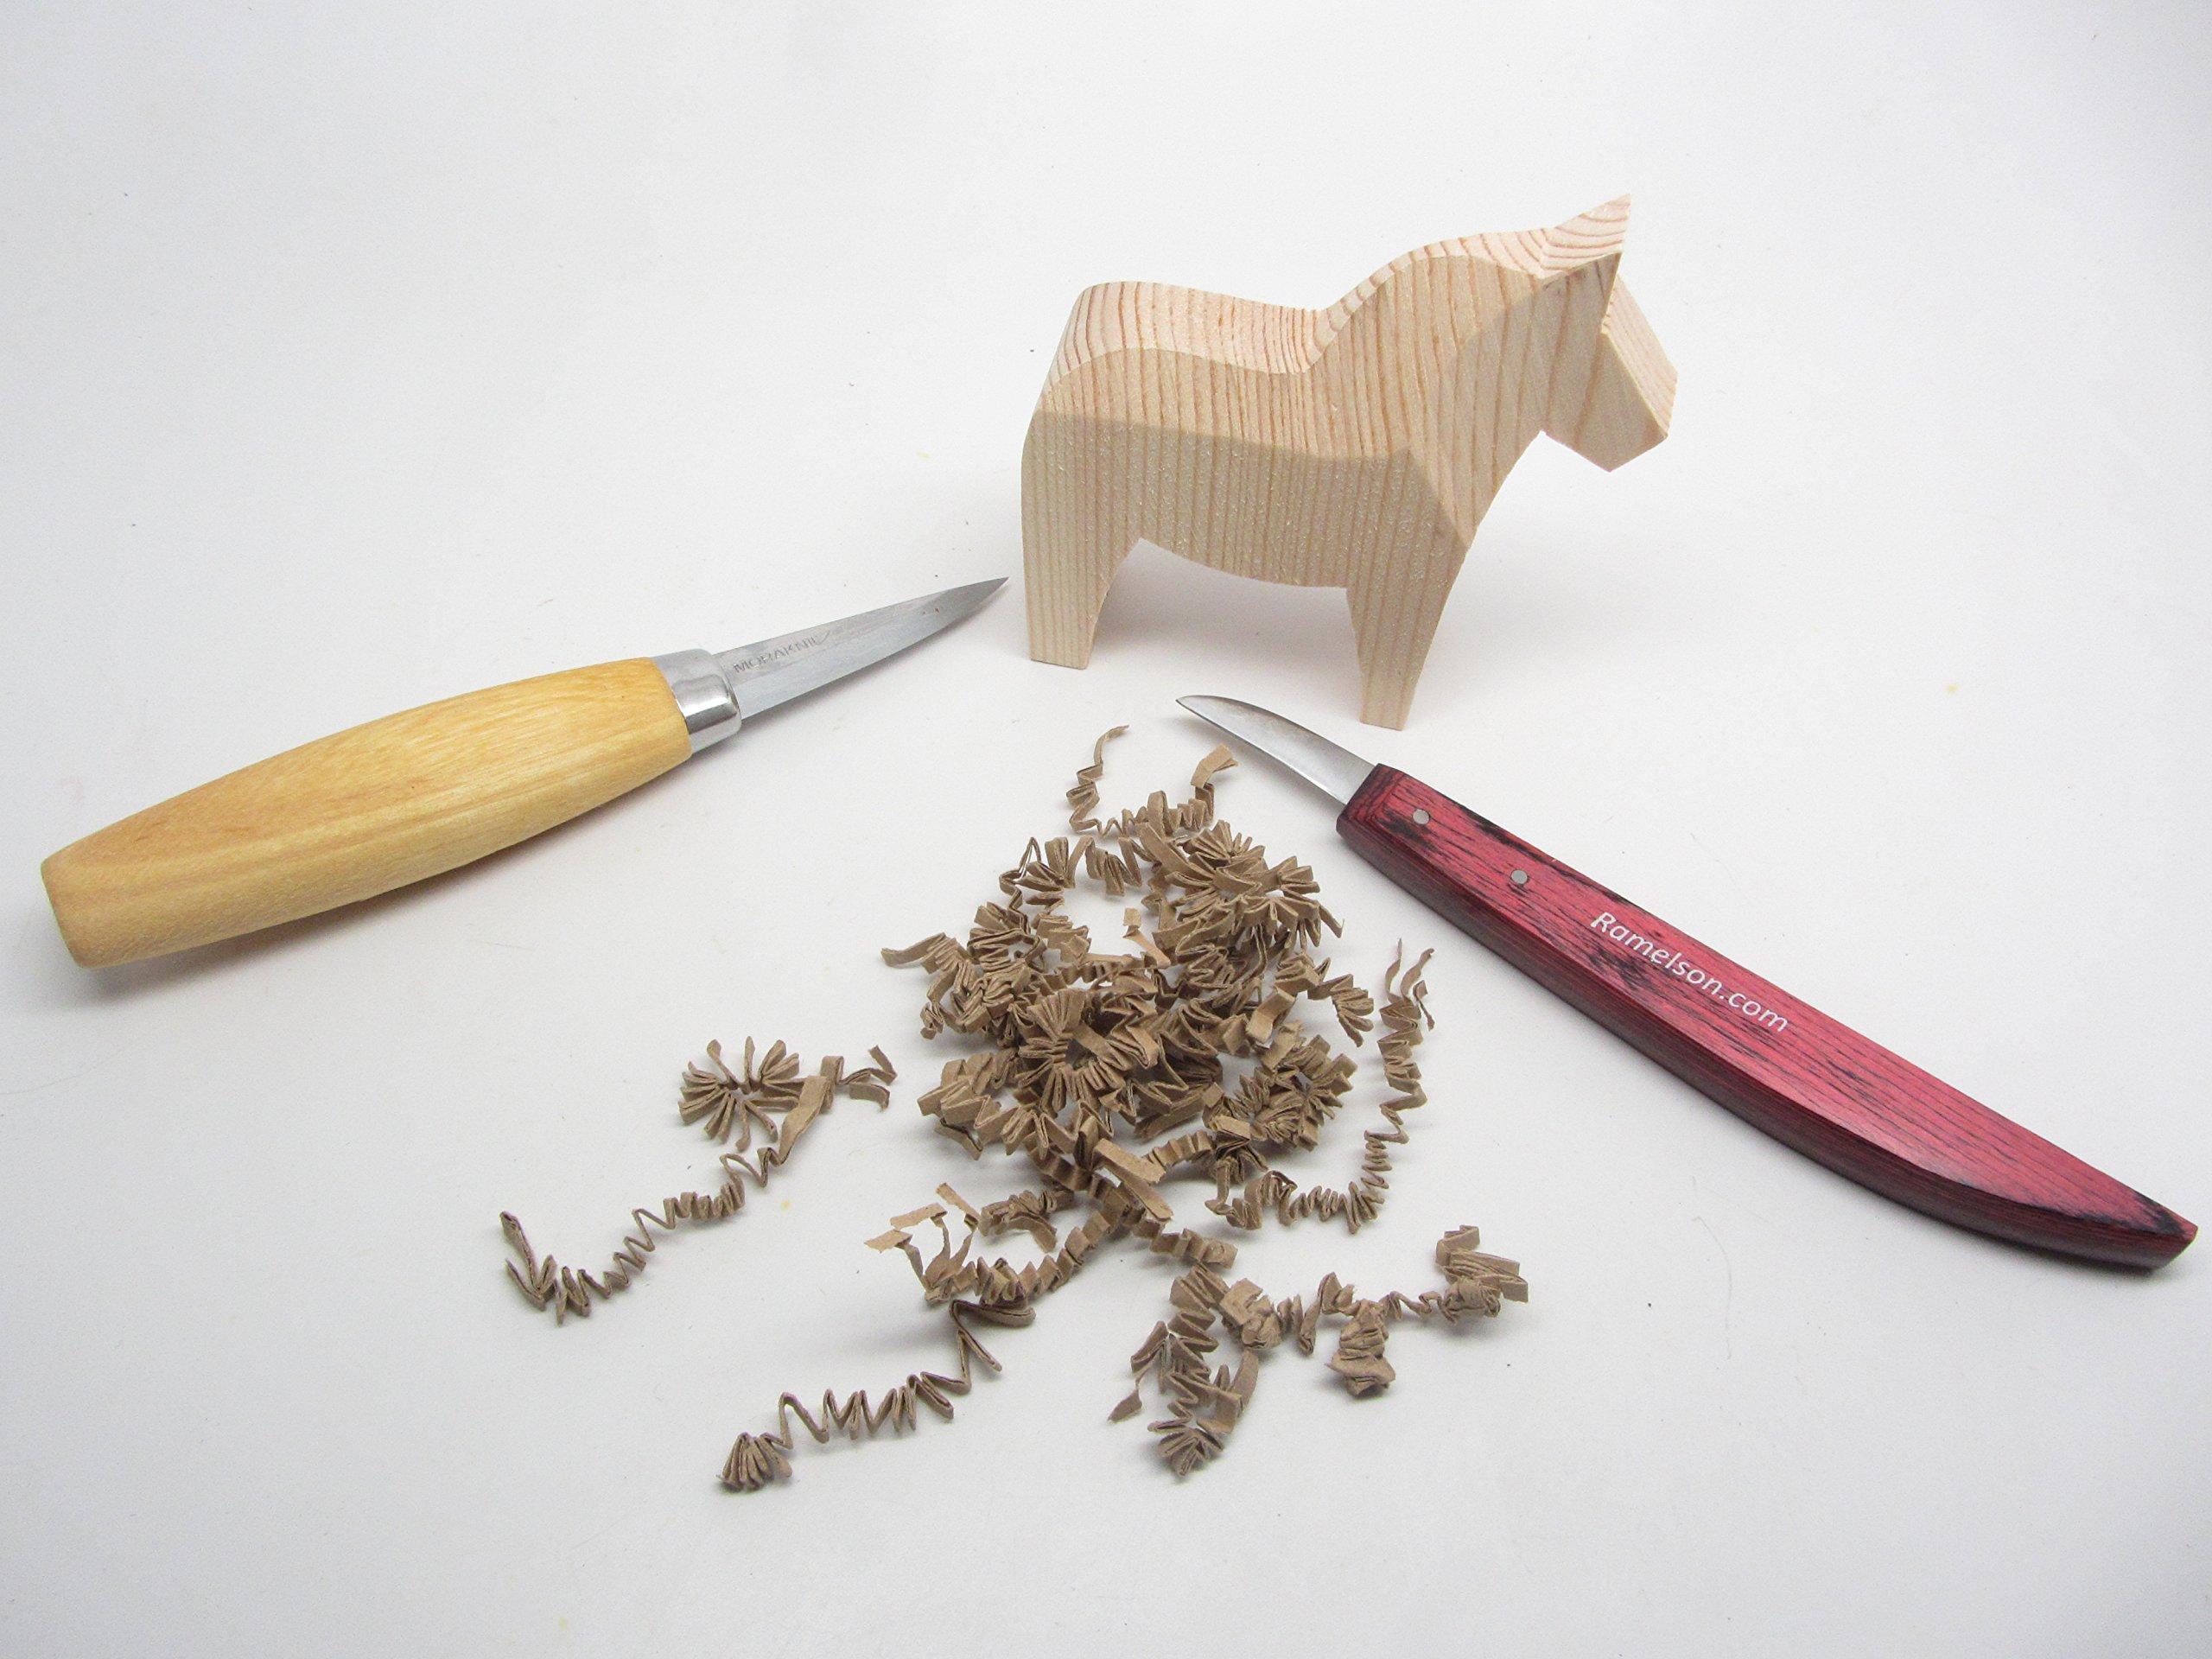 Morakniv Carving Kit 120 Carving Knife and Rough Cut Wooden Swedish Dala Horse by Morakniv